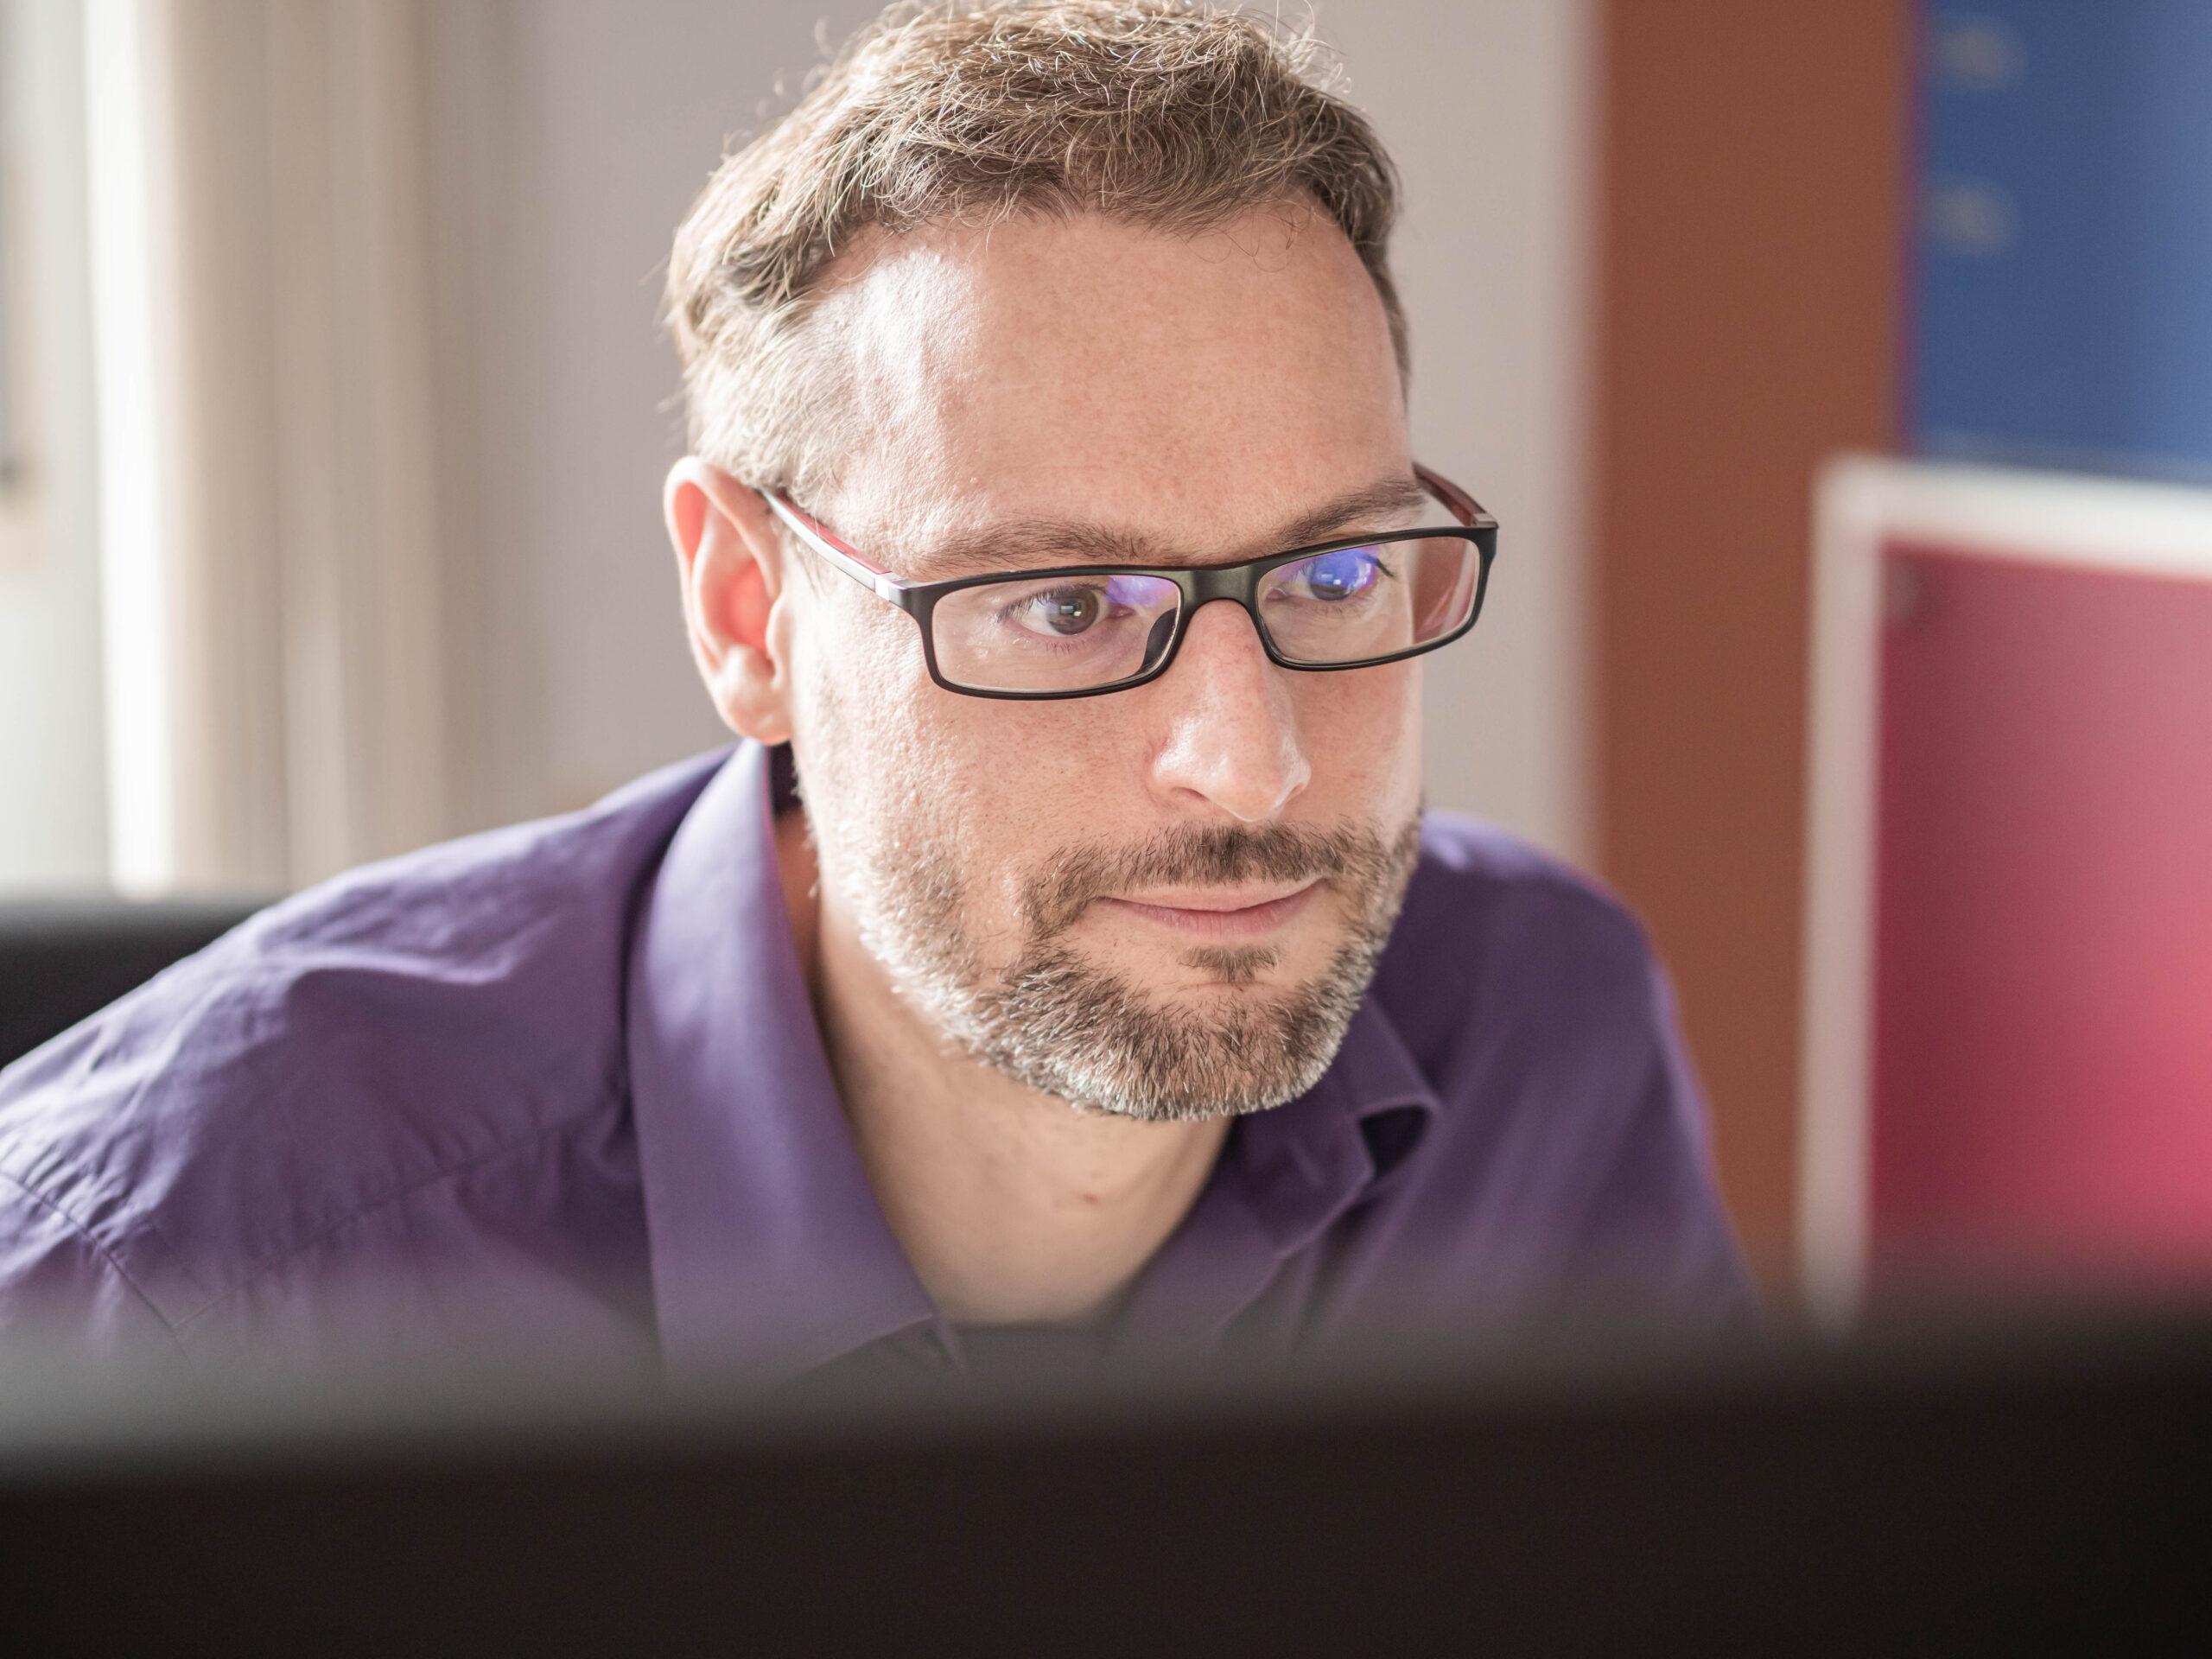 Allan                                                    Zimmermann                                                    - Expert en veille et information technologique / Responsable Informatique